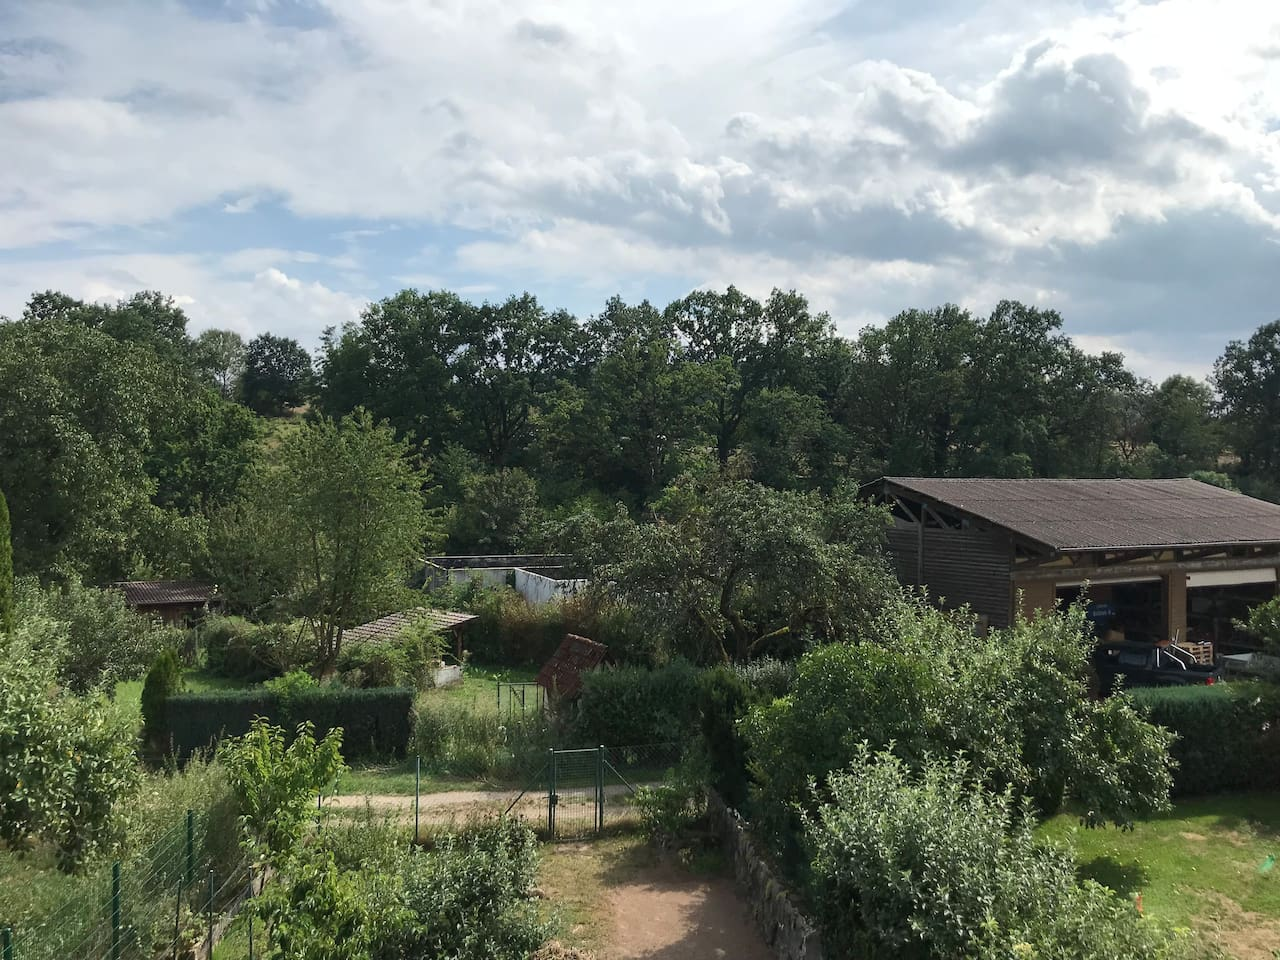 Ausblick vom Balkon ins Grüne - Richtung Feld & Wald